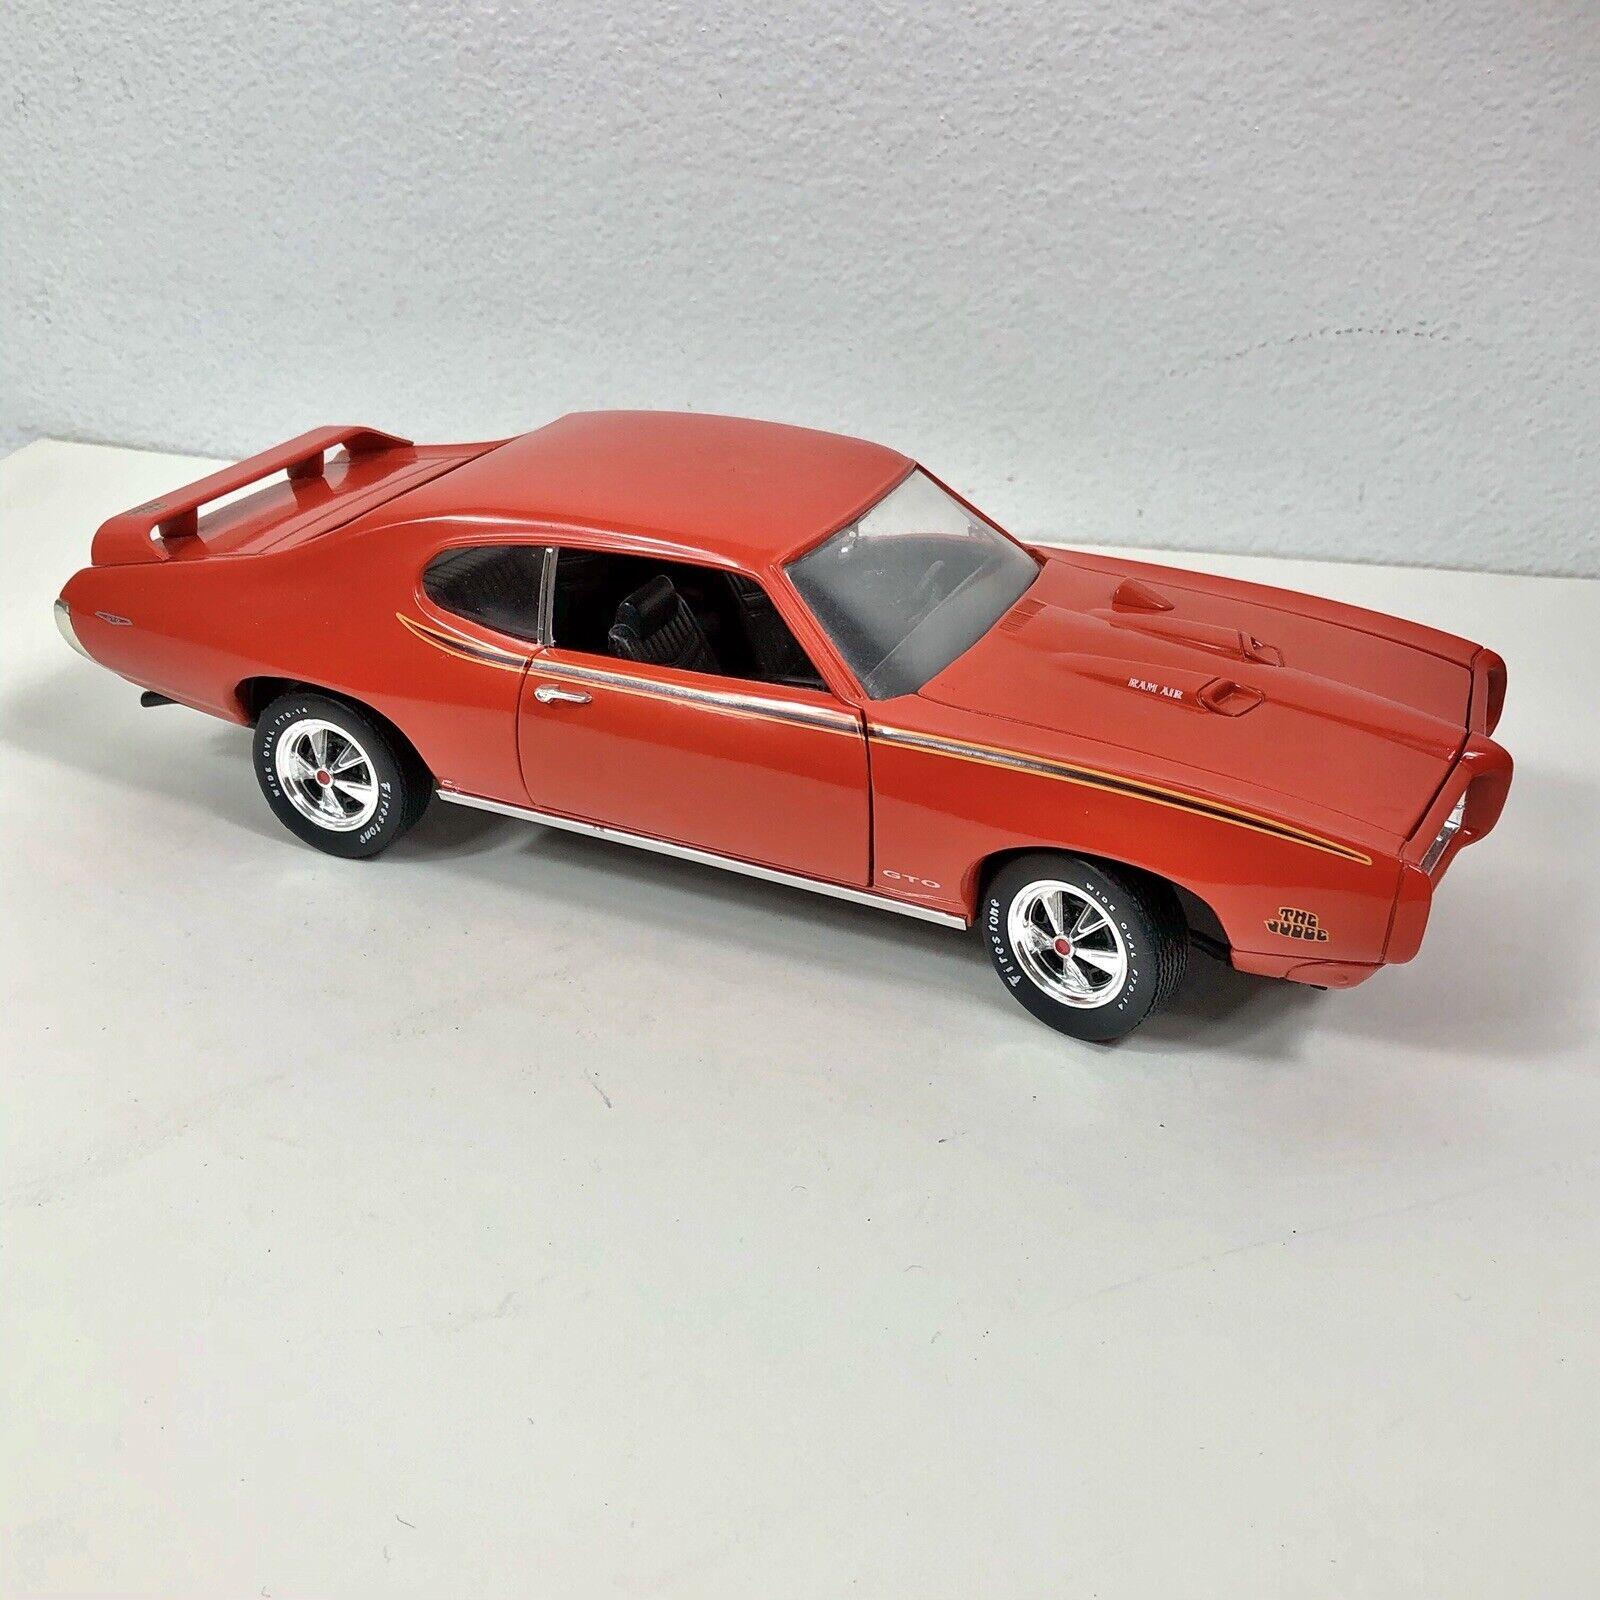 Ertl 1 18 1969 Pontiac Gto Judge Carousel Red Orange 7467 American Muscle 69 For Sale Online Ebay